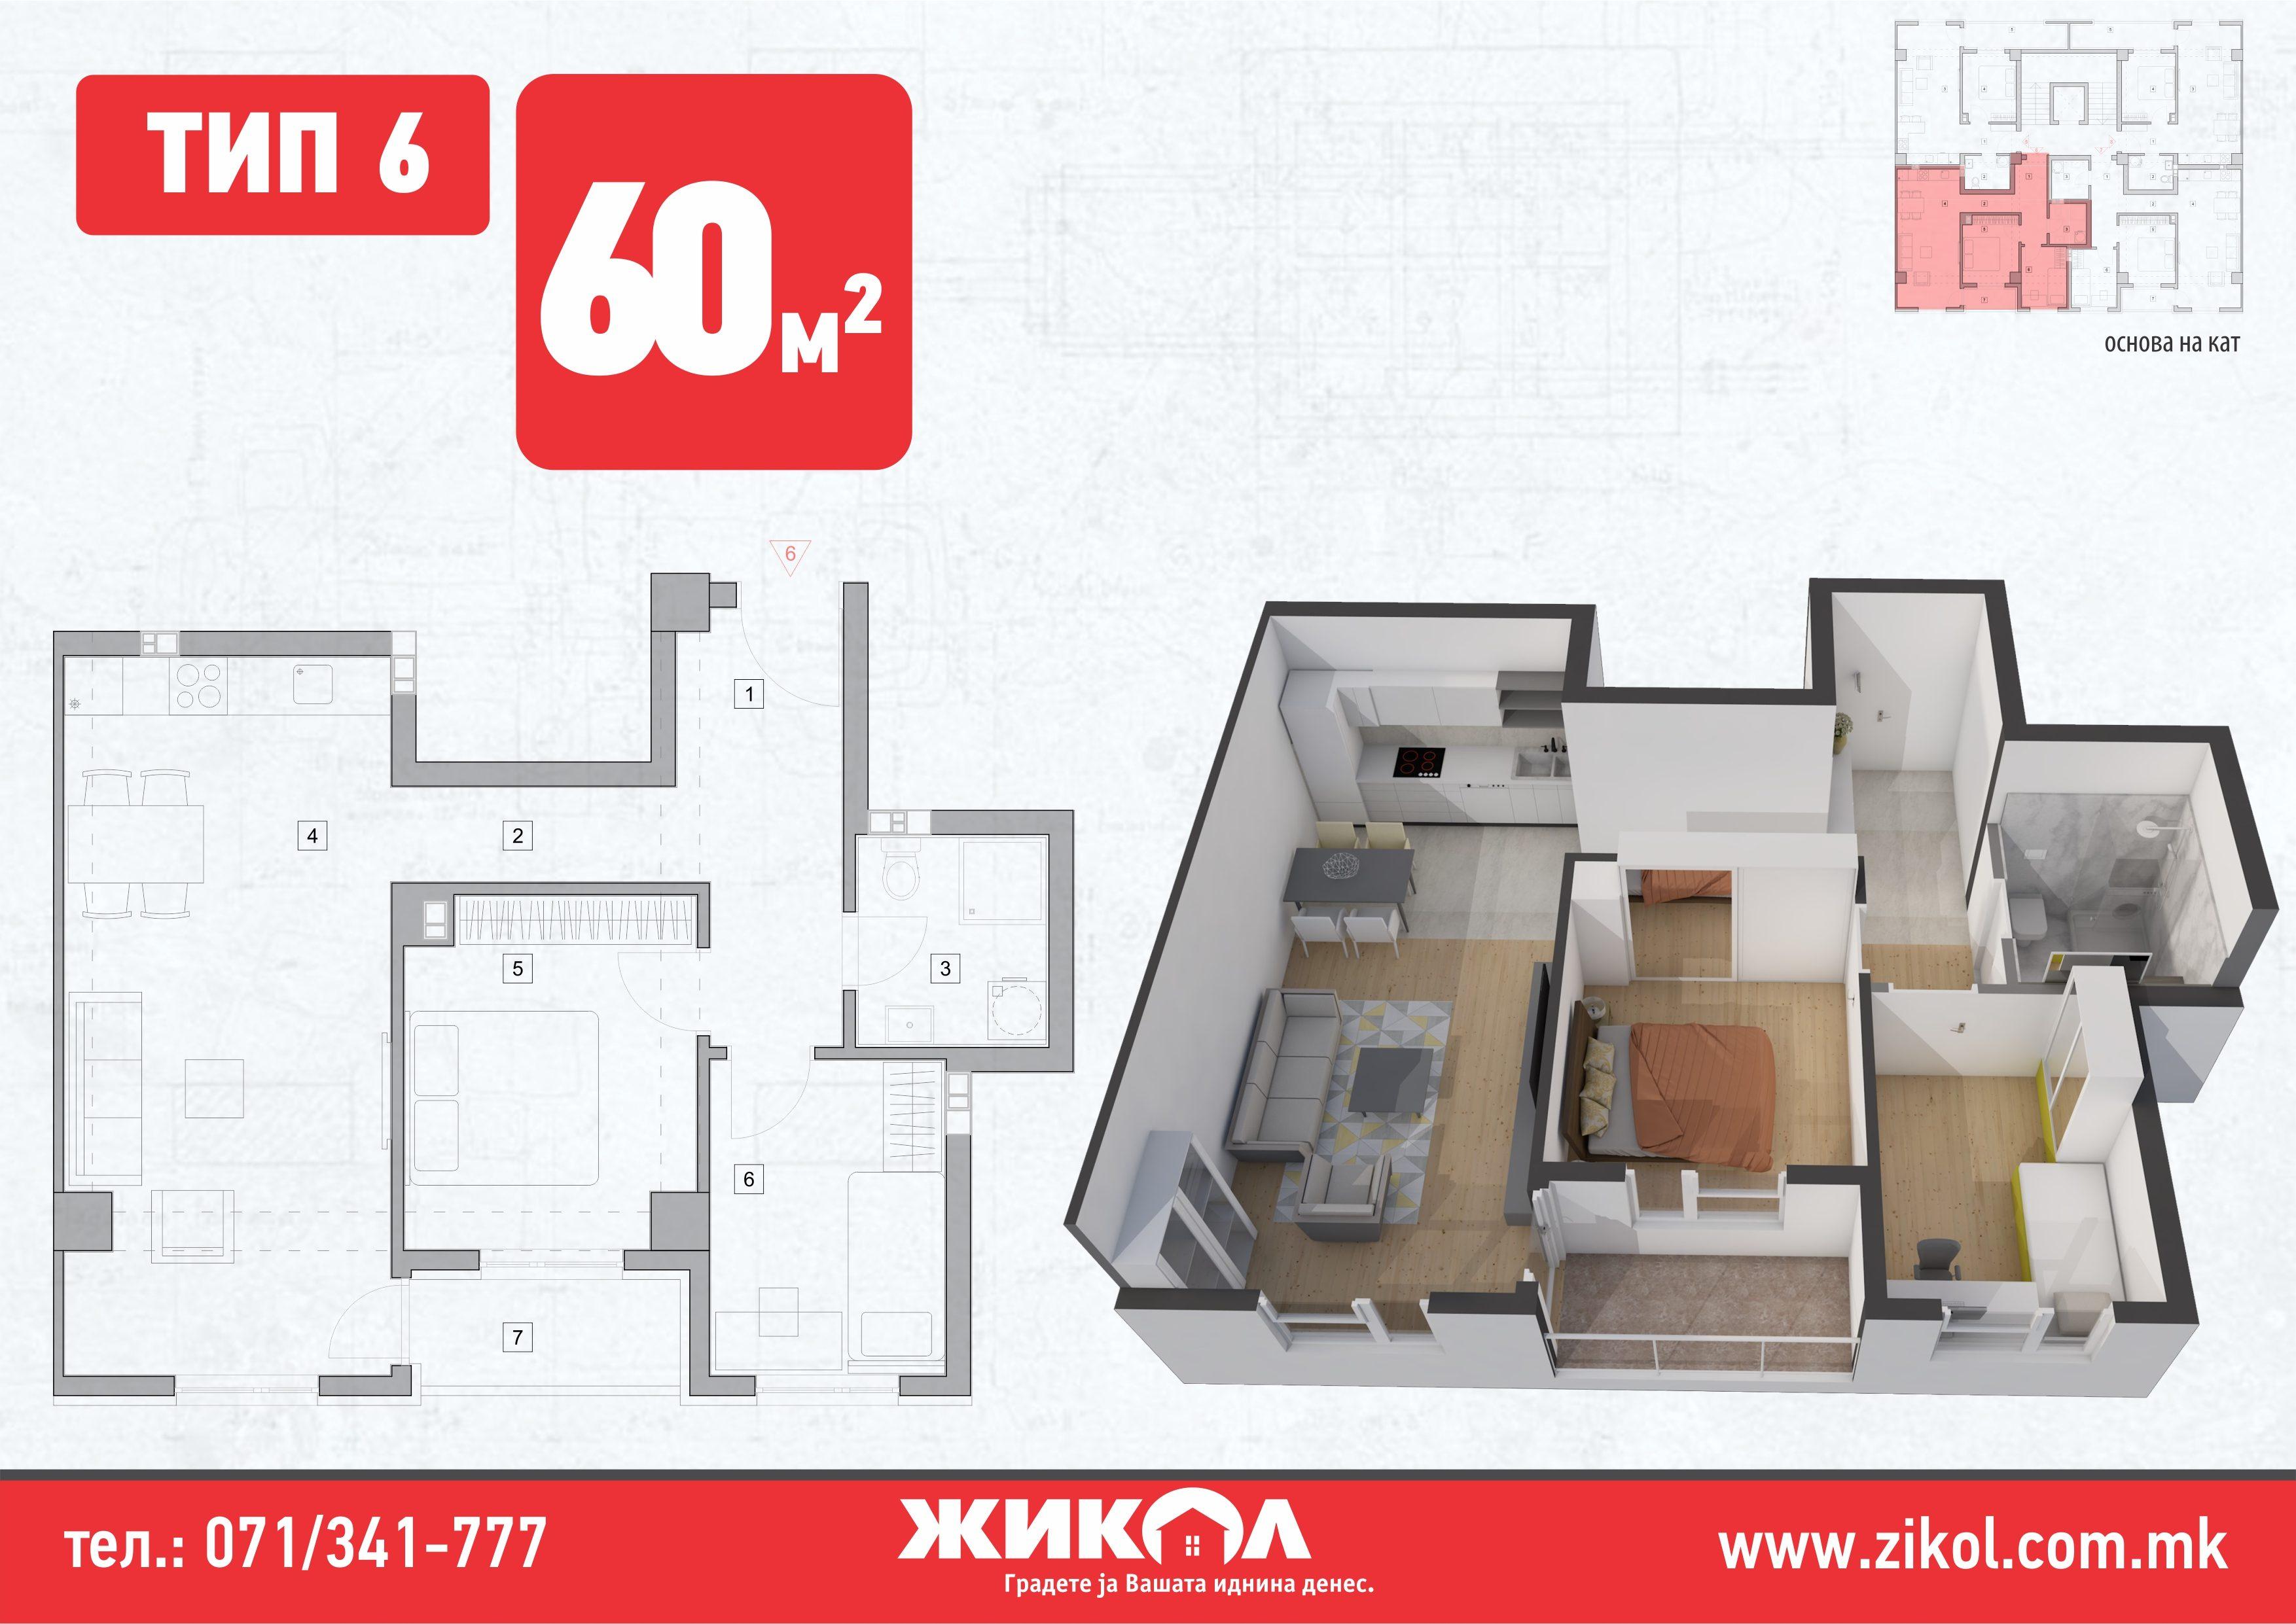 зграда 7, кат 4, стан 18